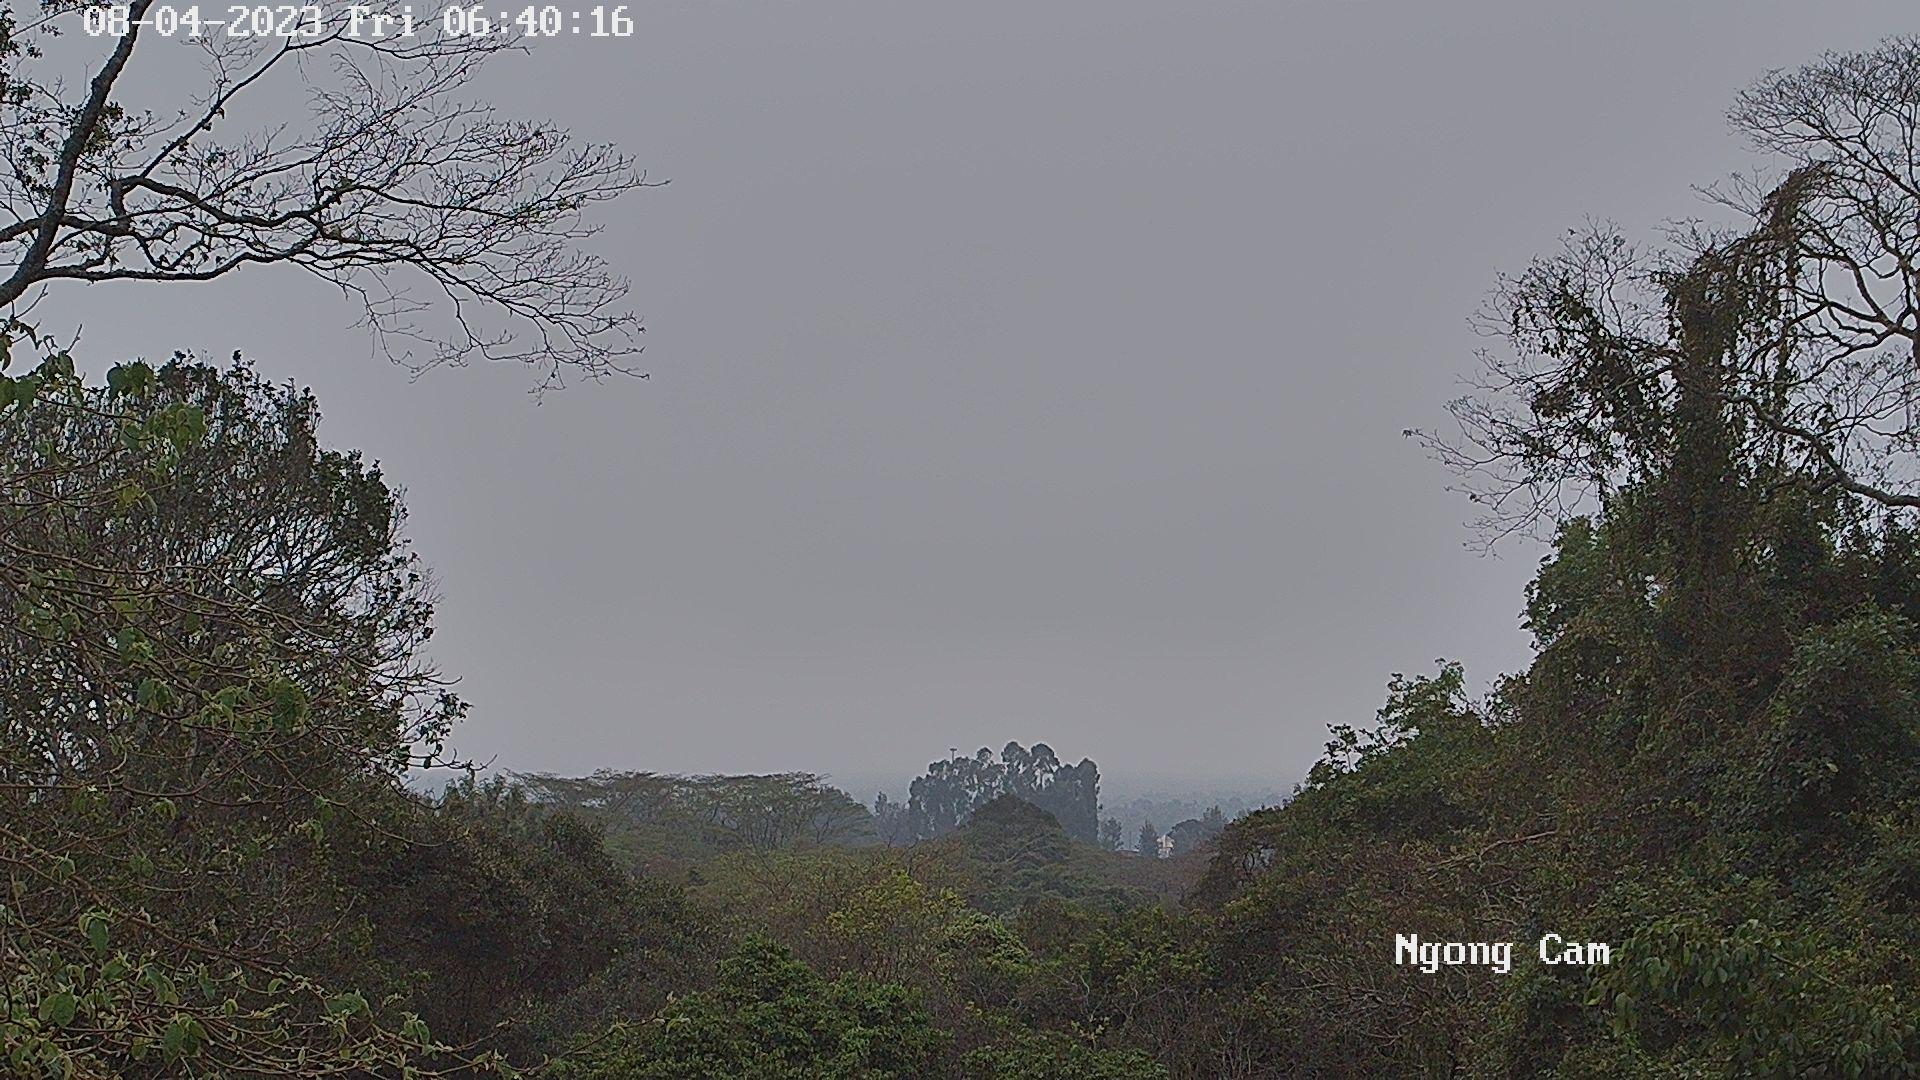 Mount Longonot Mi. 06:47